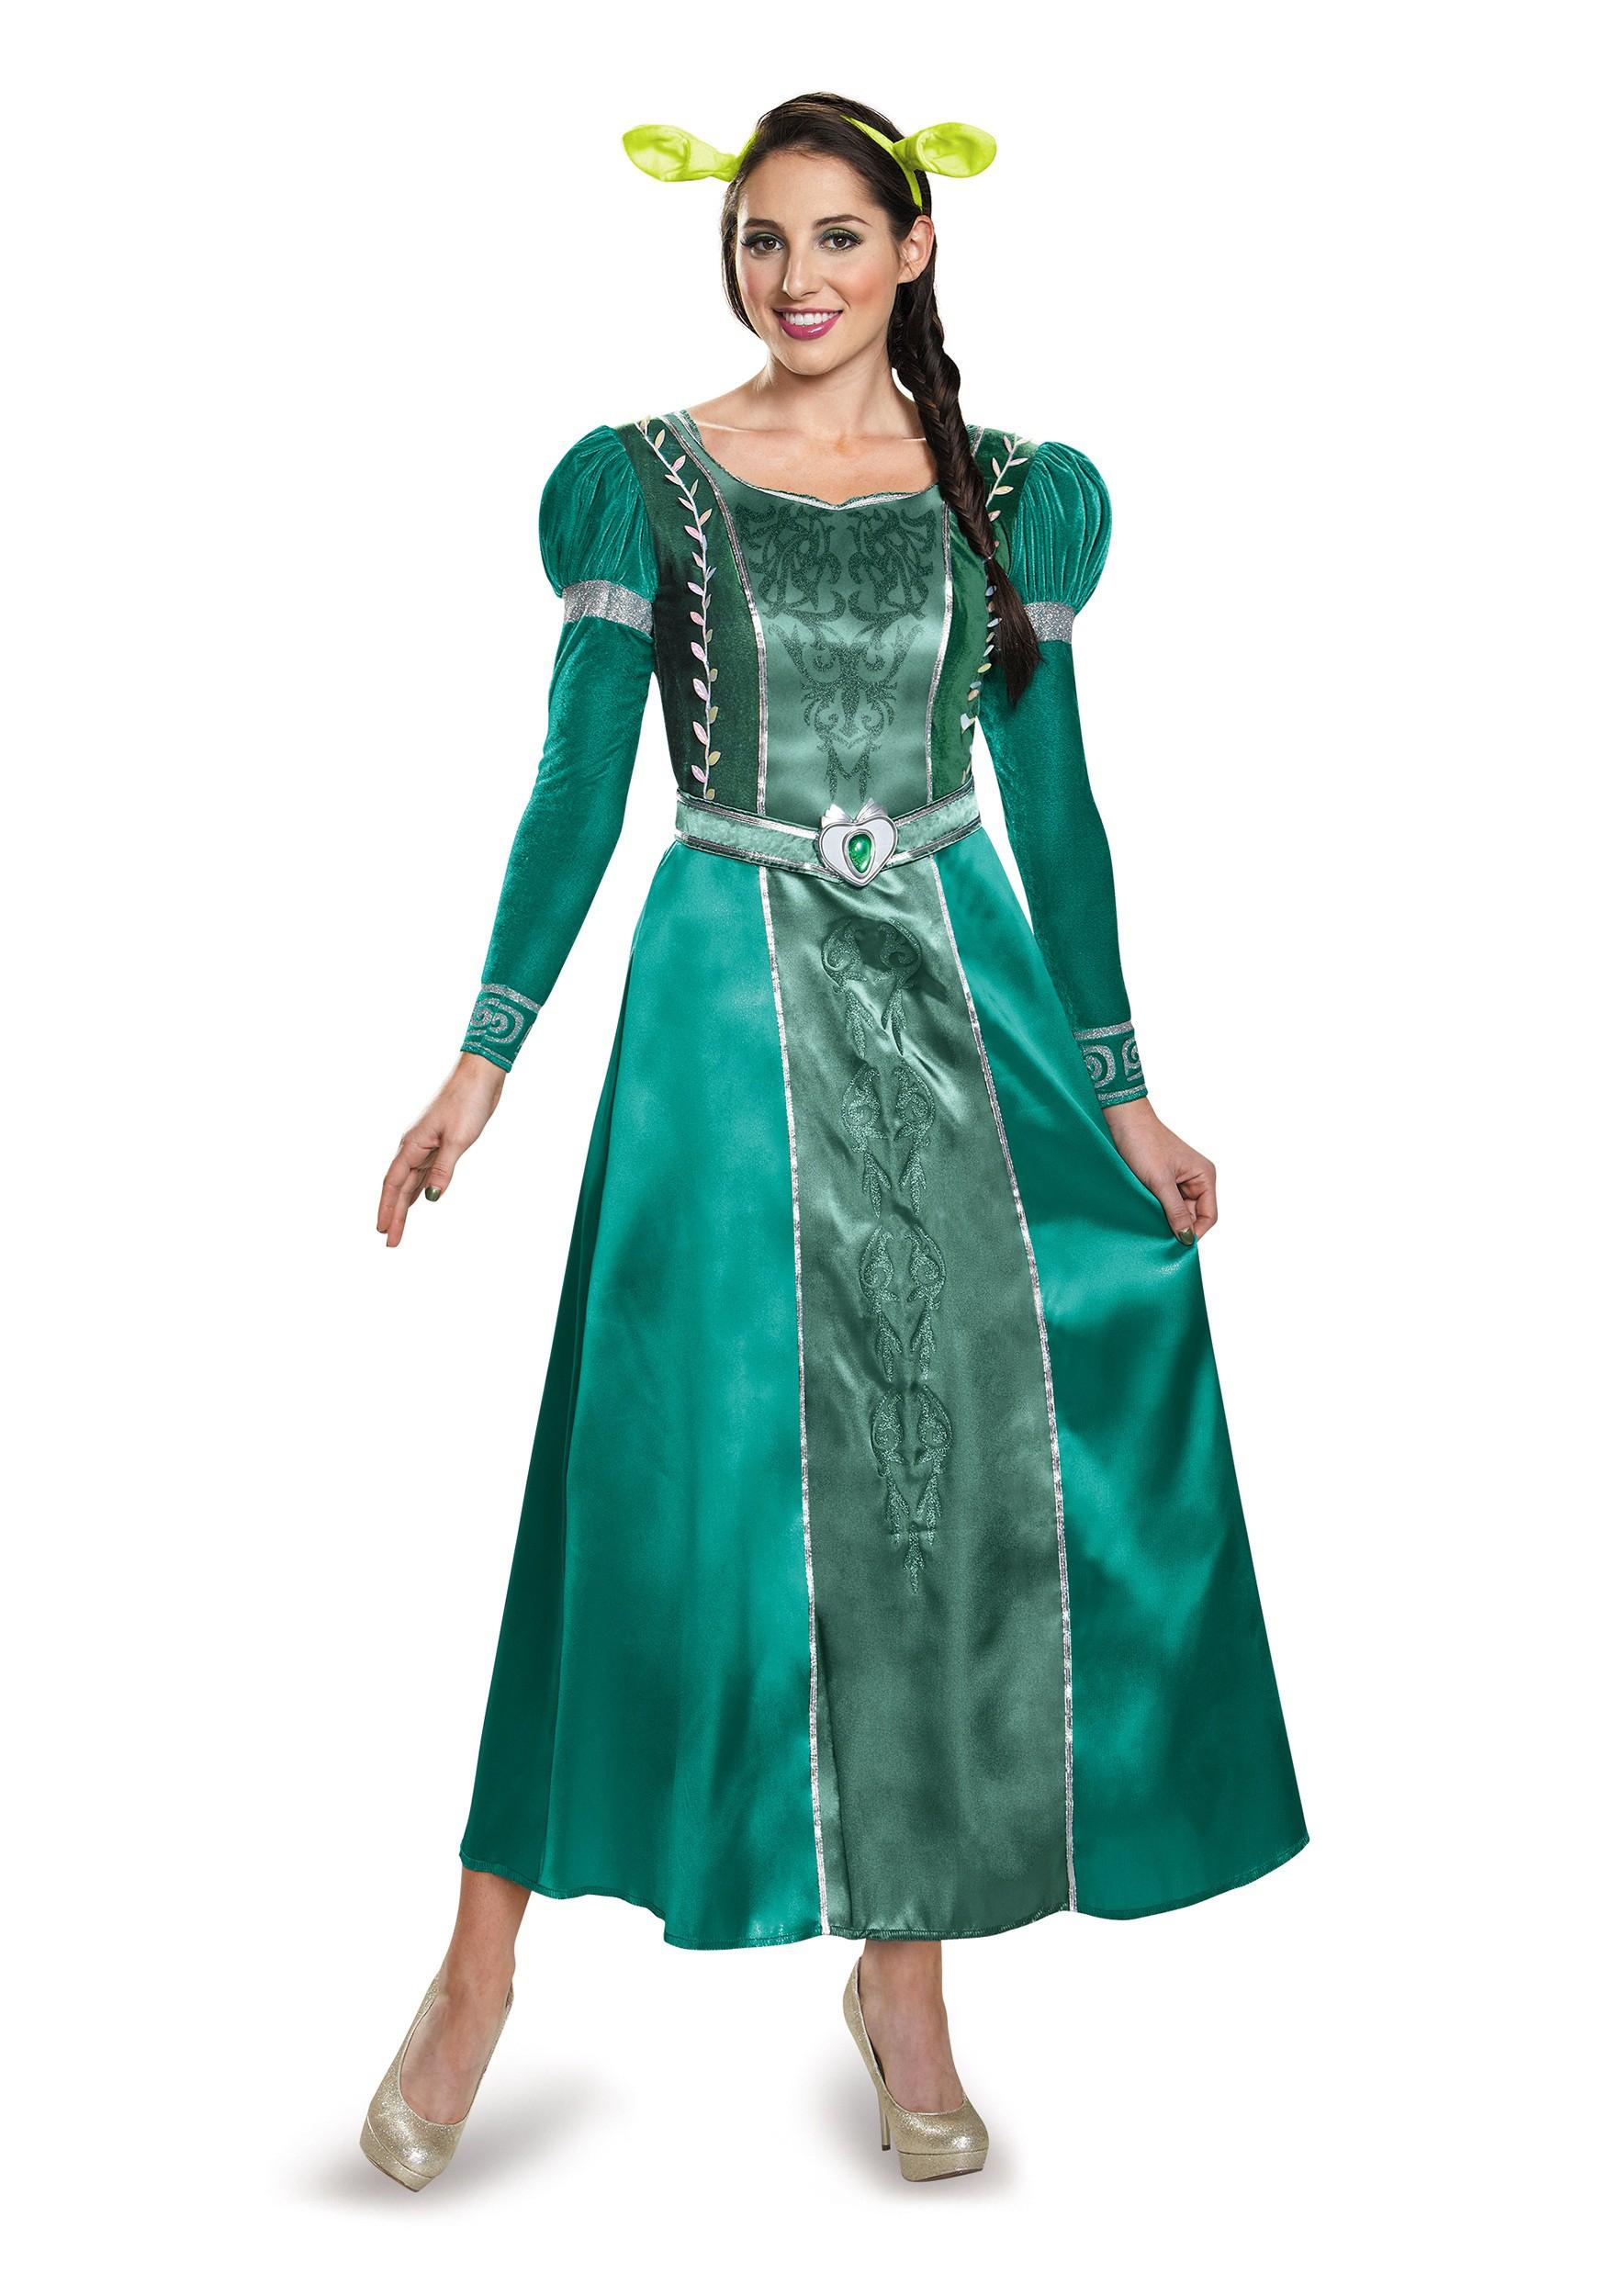 Shrek Costumes